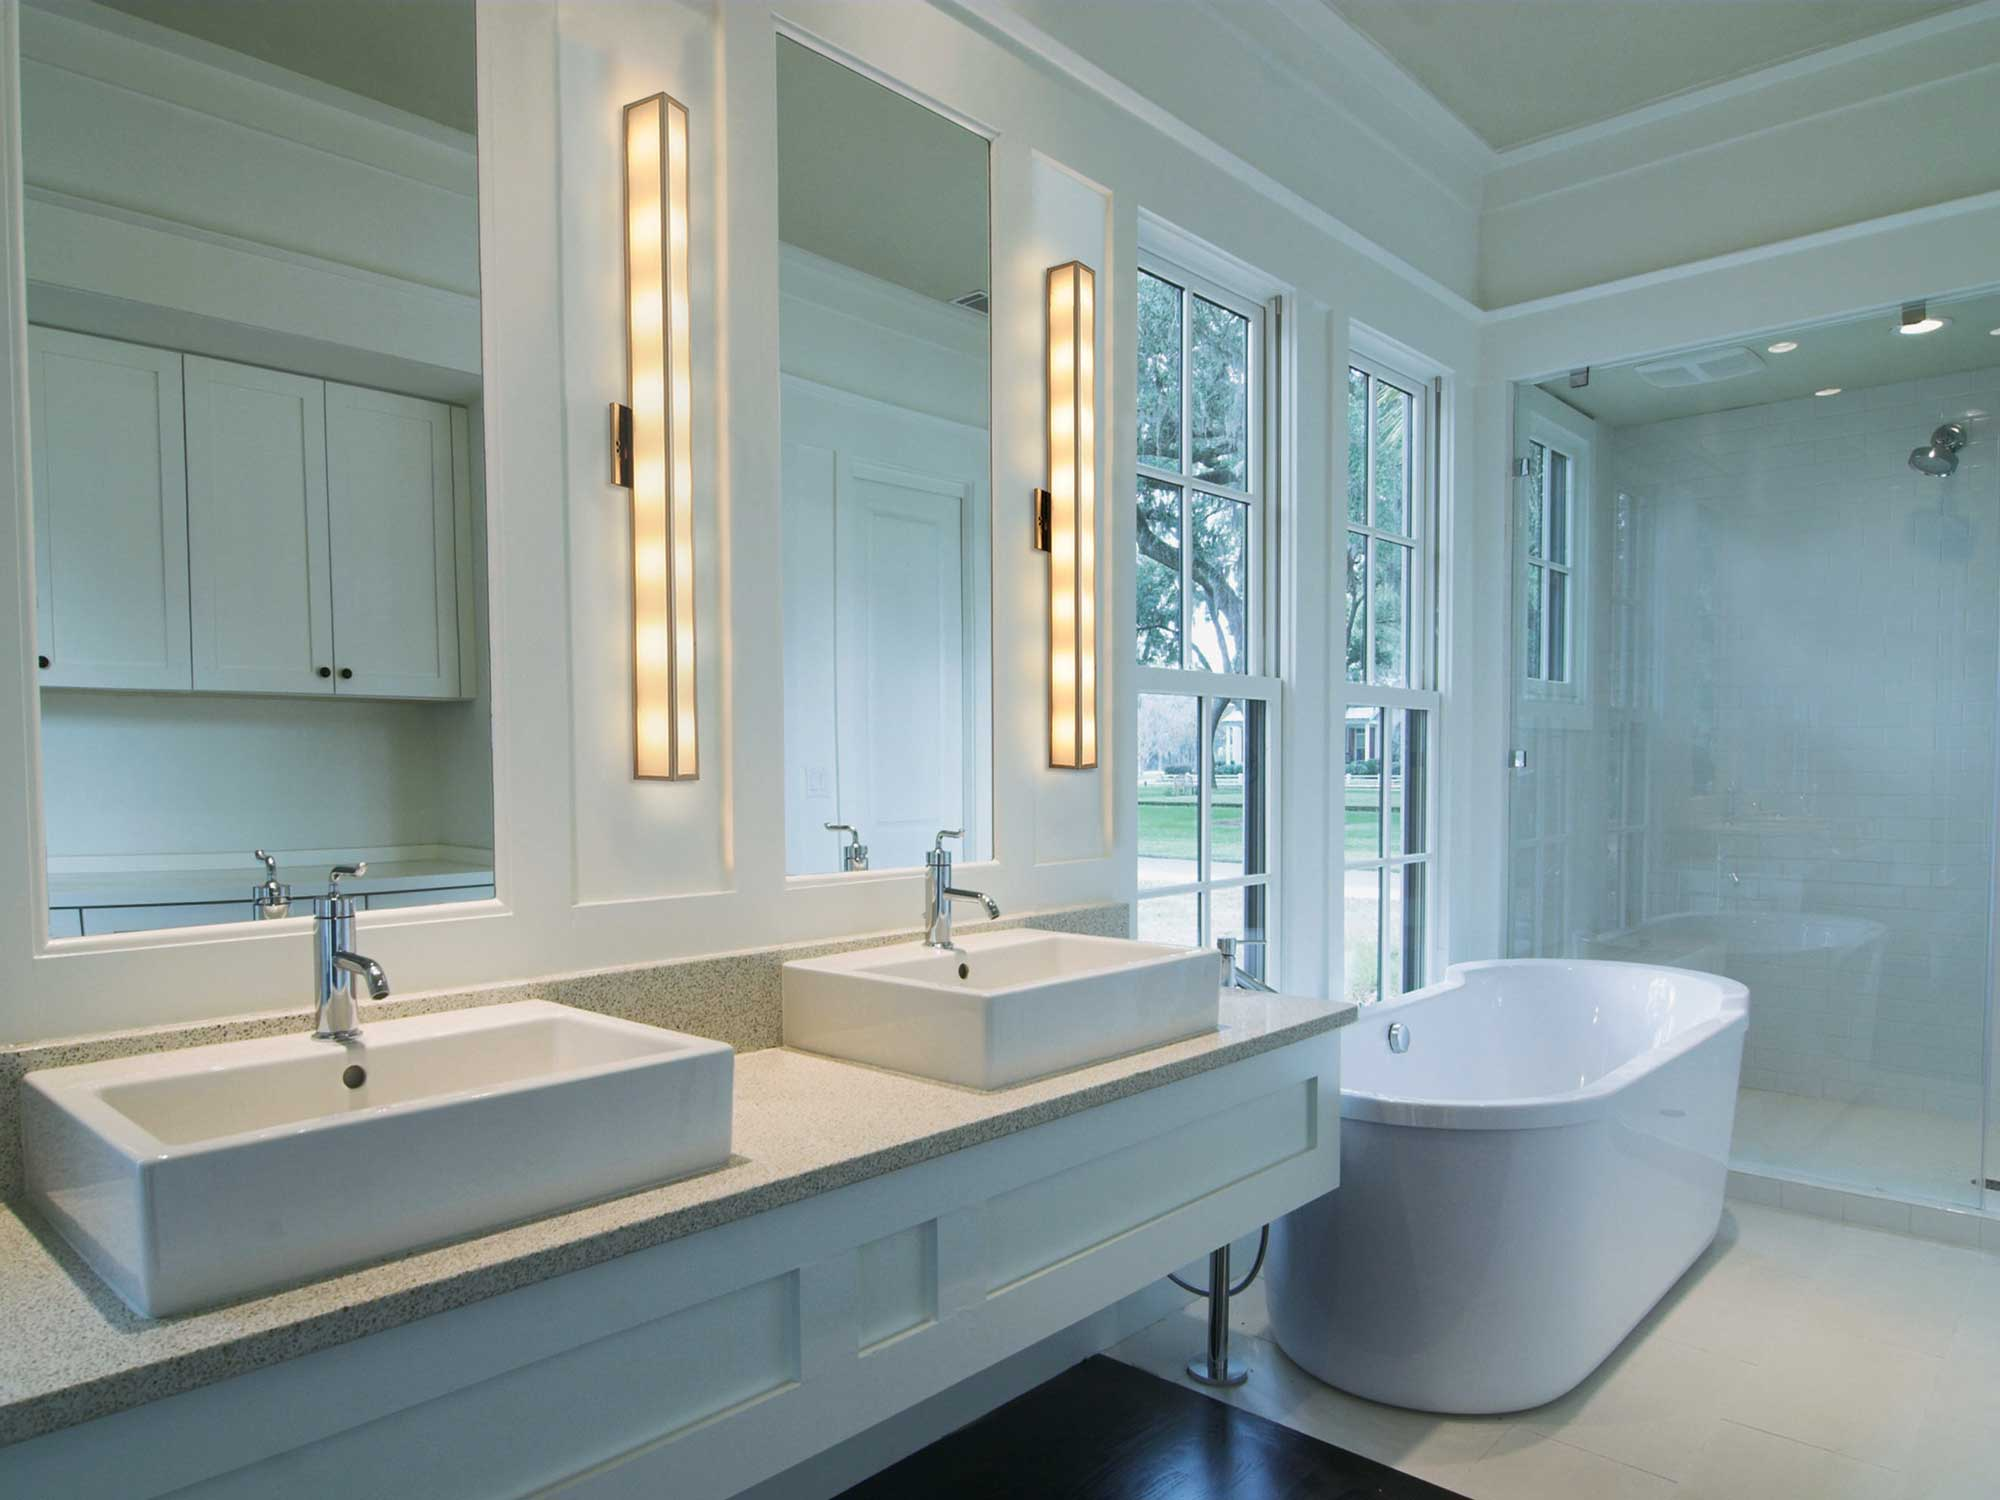 Moises Malave Ala Lighting Specialist Chicago Showroom